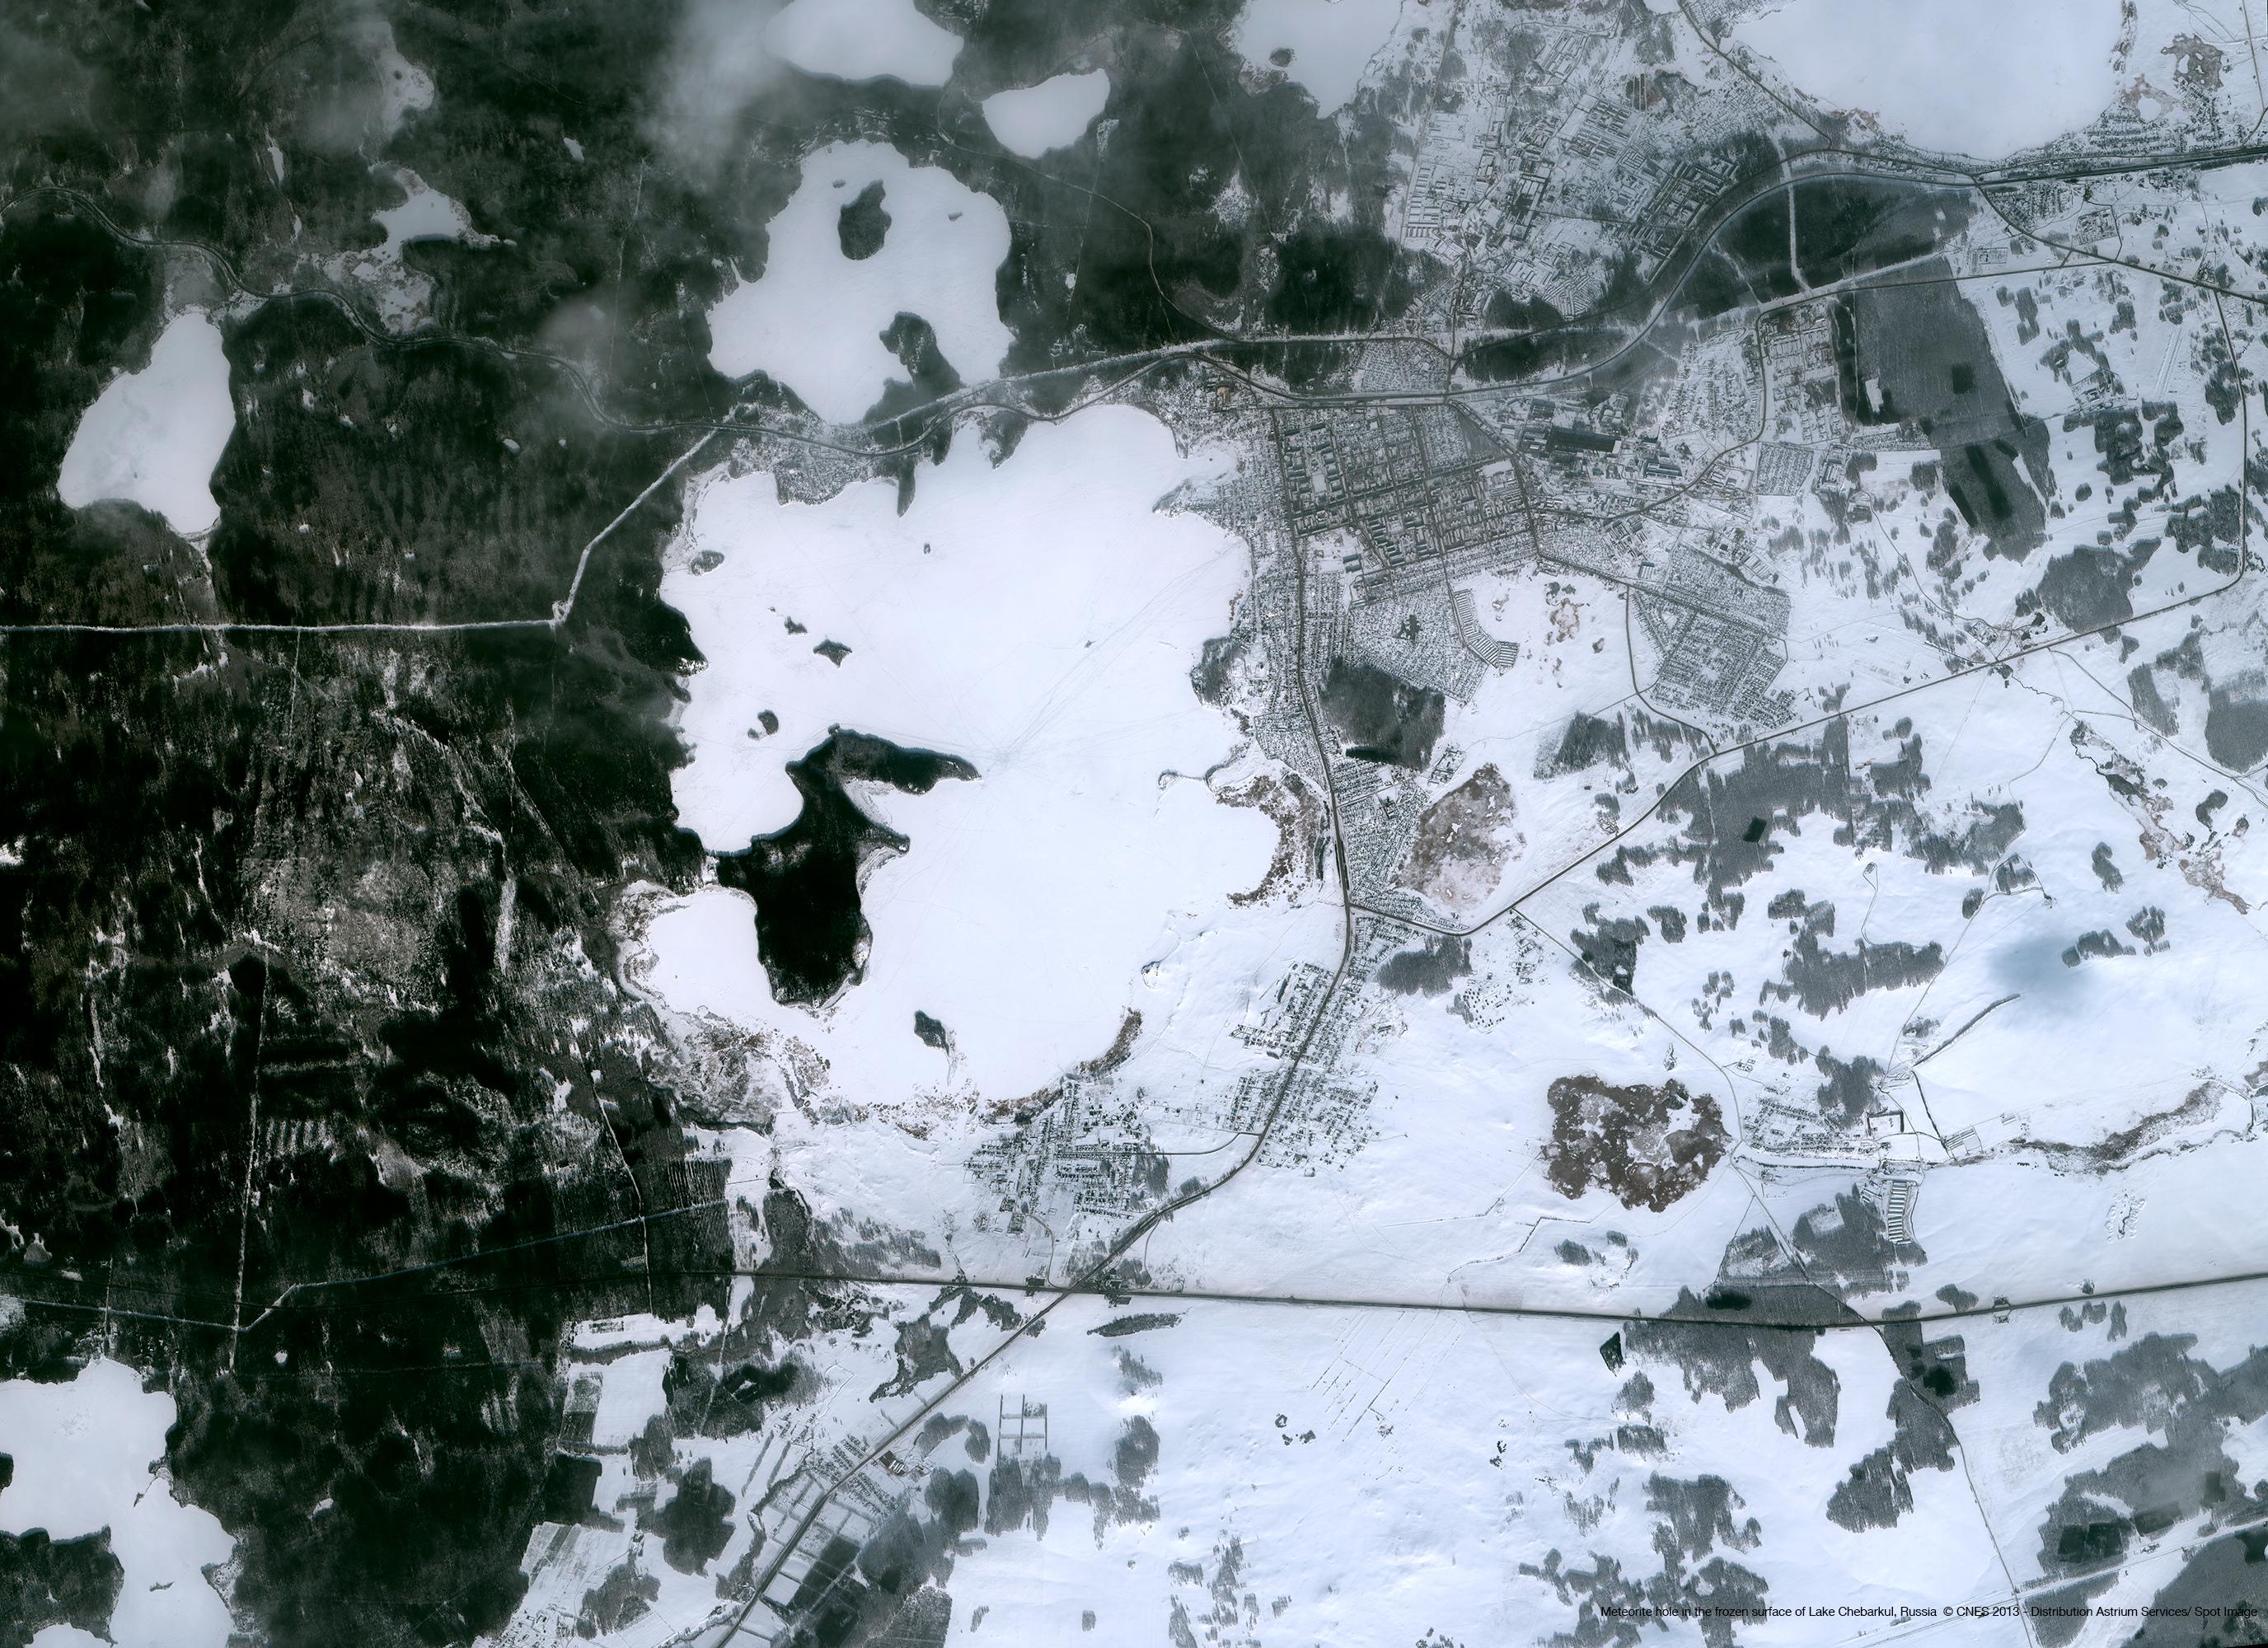 r18525_39_satellite_image_pleiades_meteorite_lake_chebarkul_russia_2013_low.png